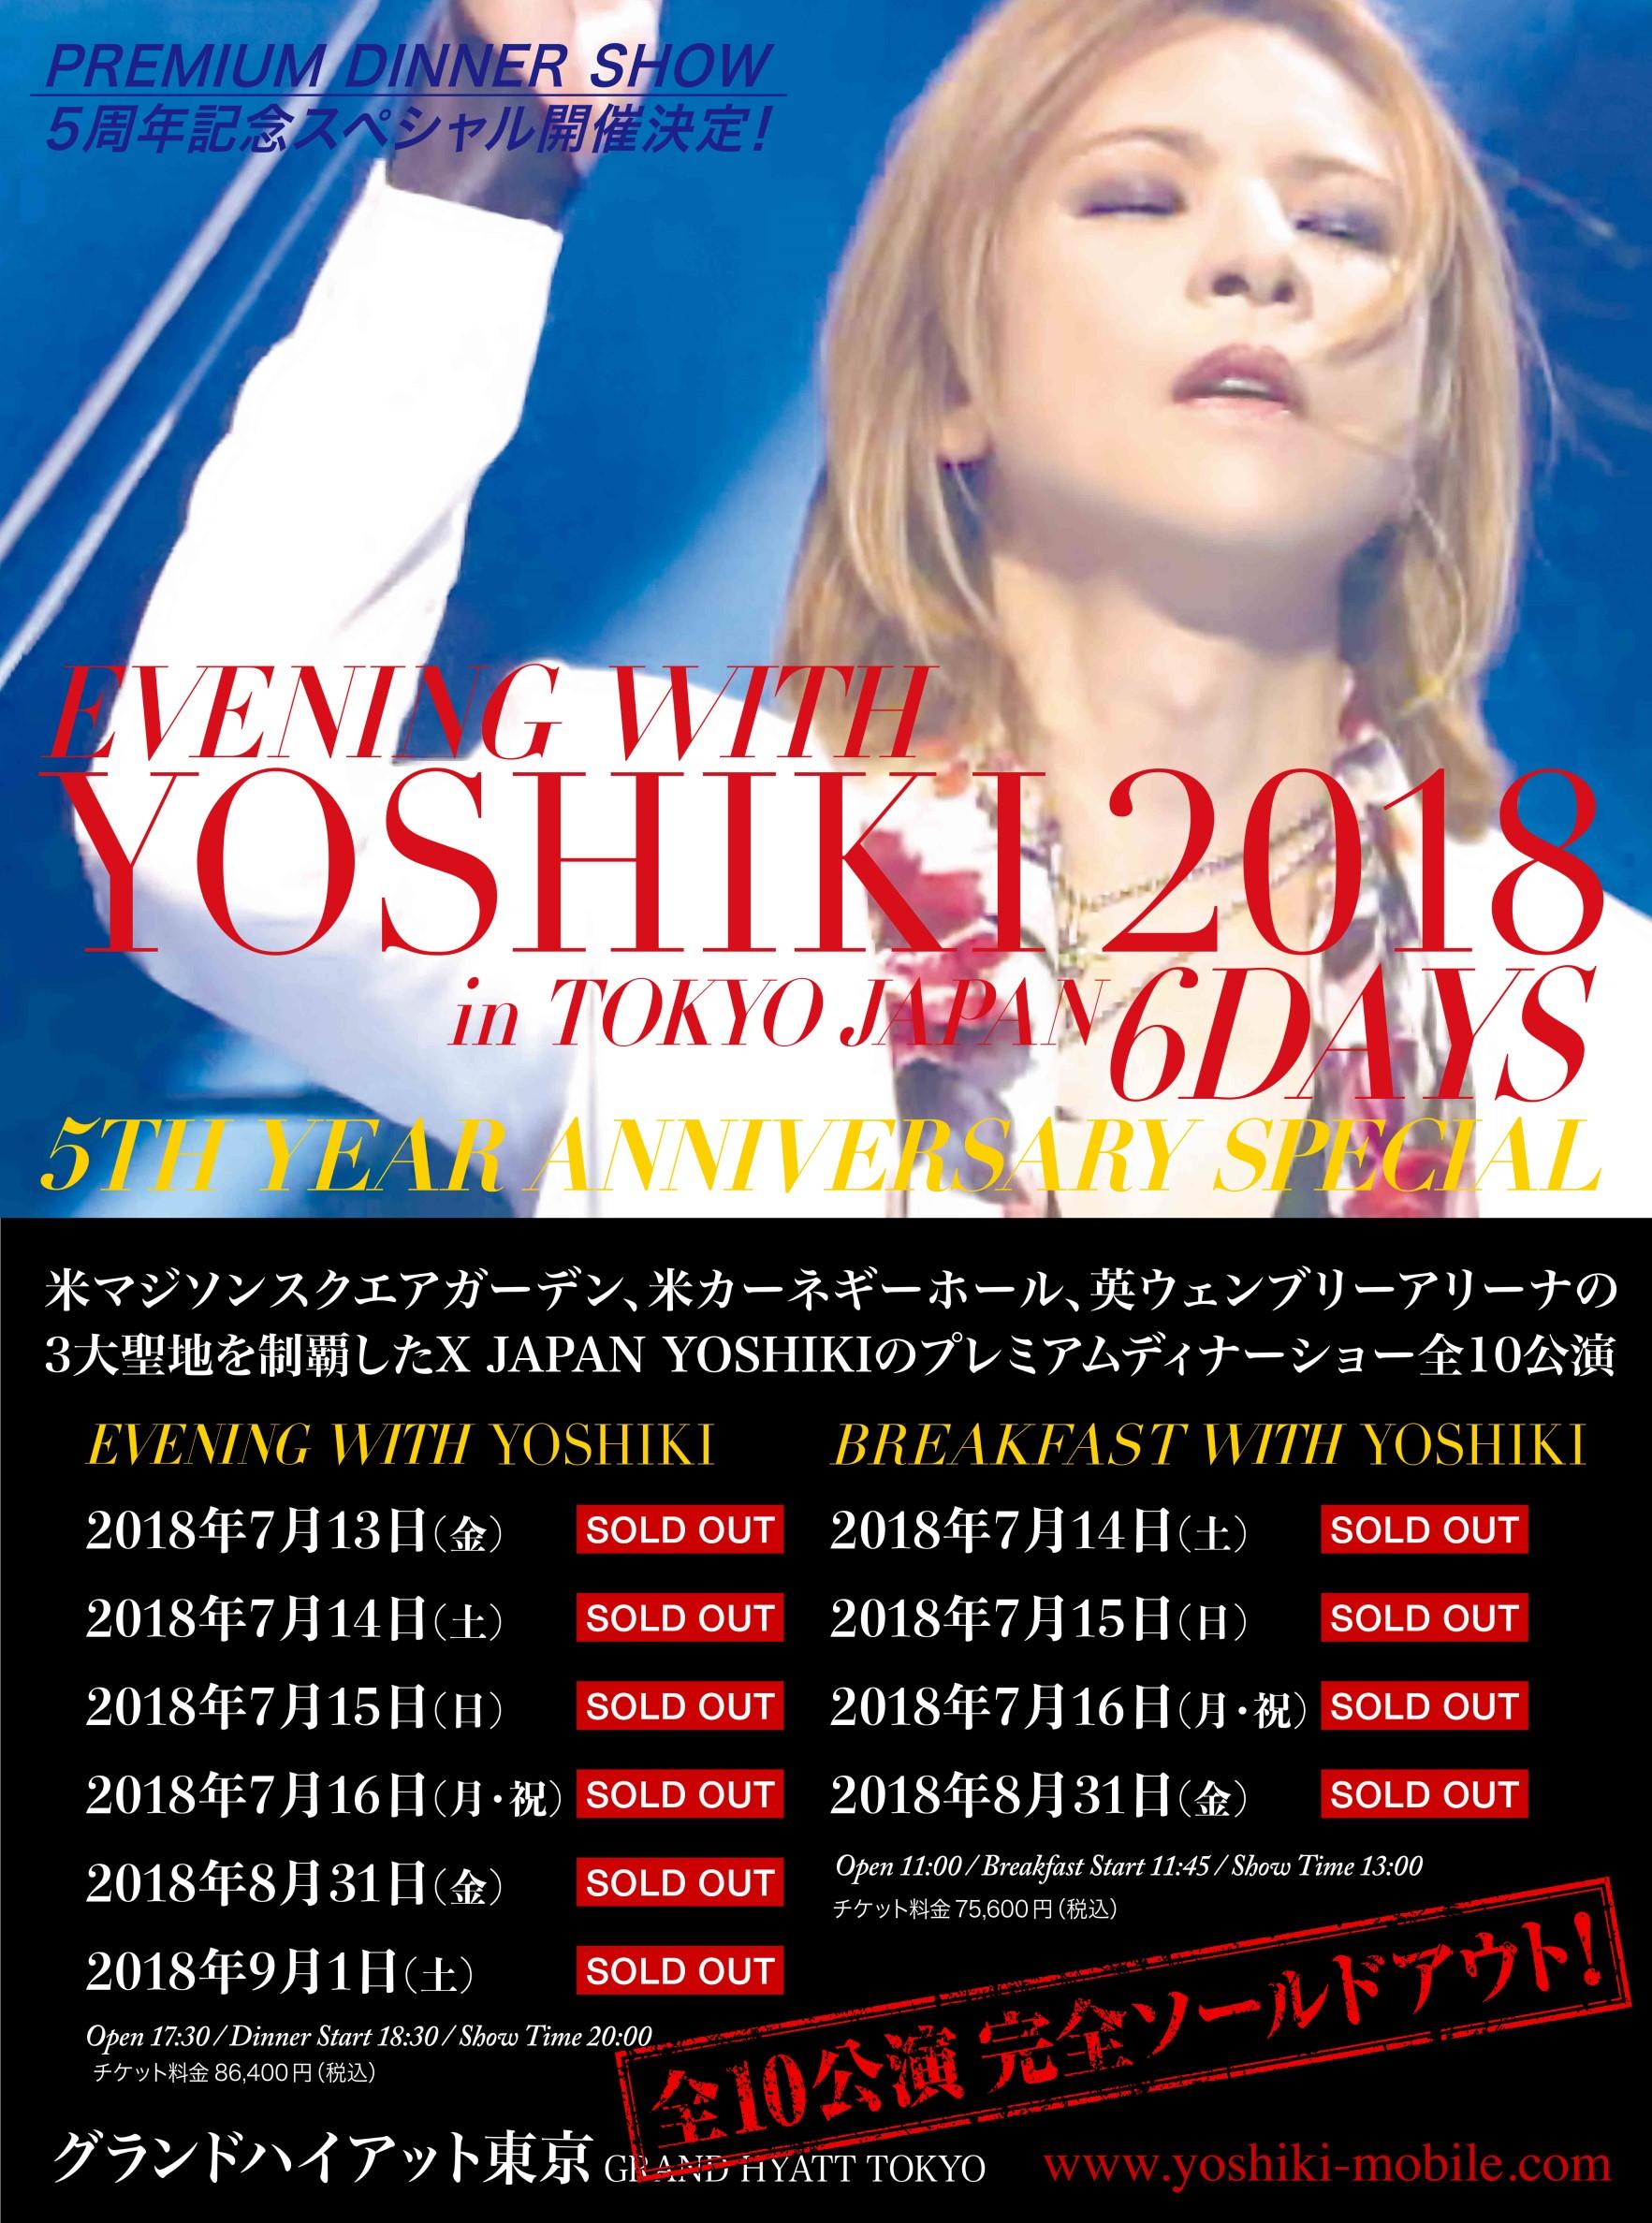 JRock247-Yoshiki-Dinner-Show-5th-Anniversary-2018-Final-M